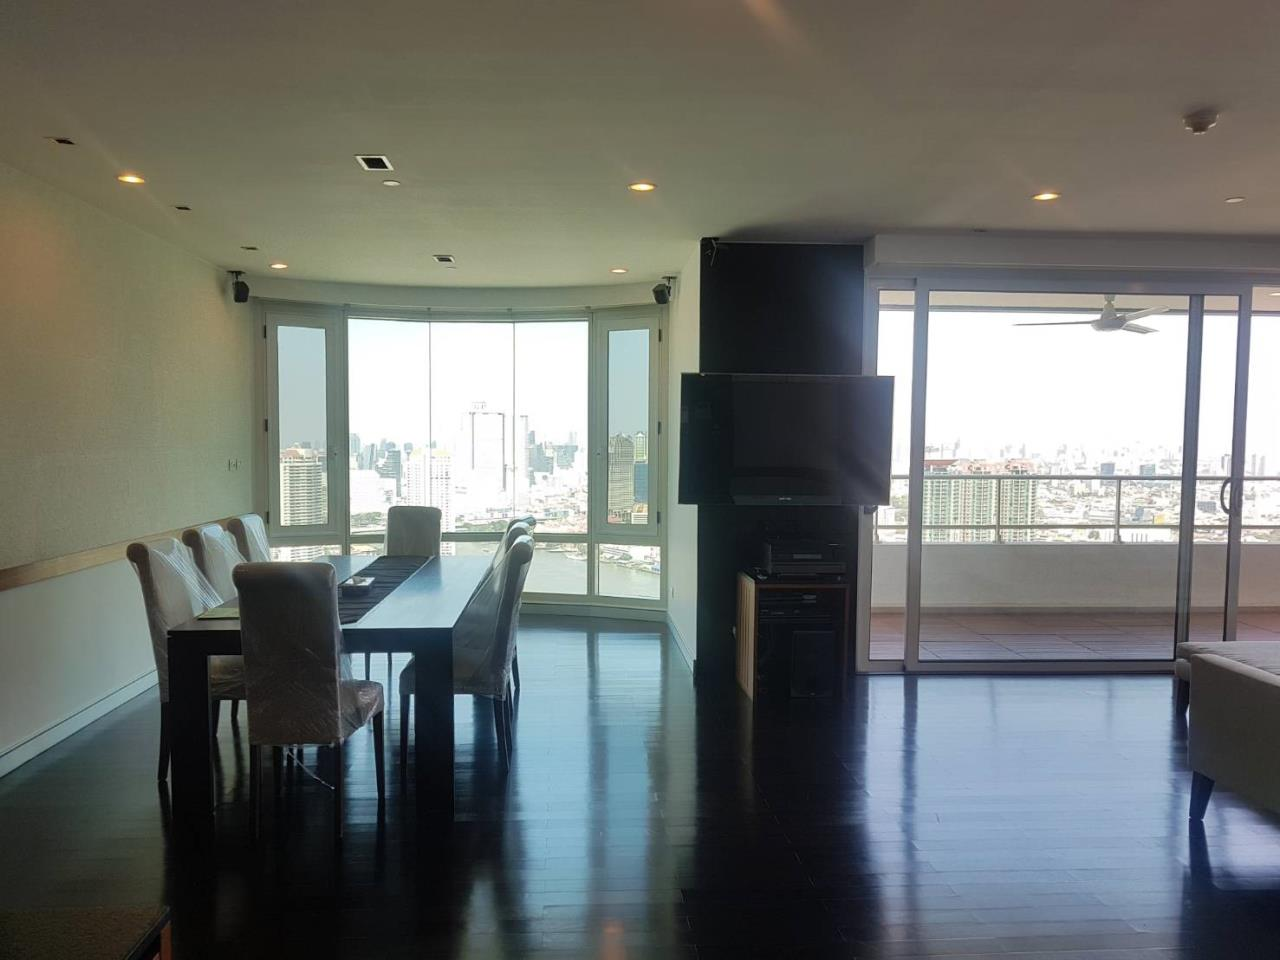 SALA ESTATE Agency's WATERMARK CHAOPHRAYA RIVER – RIVERSIDE-NEAR ICON SIAM,豪华公寓,河景房, 4+1卧5卫,家具齐全 1